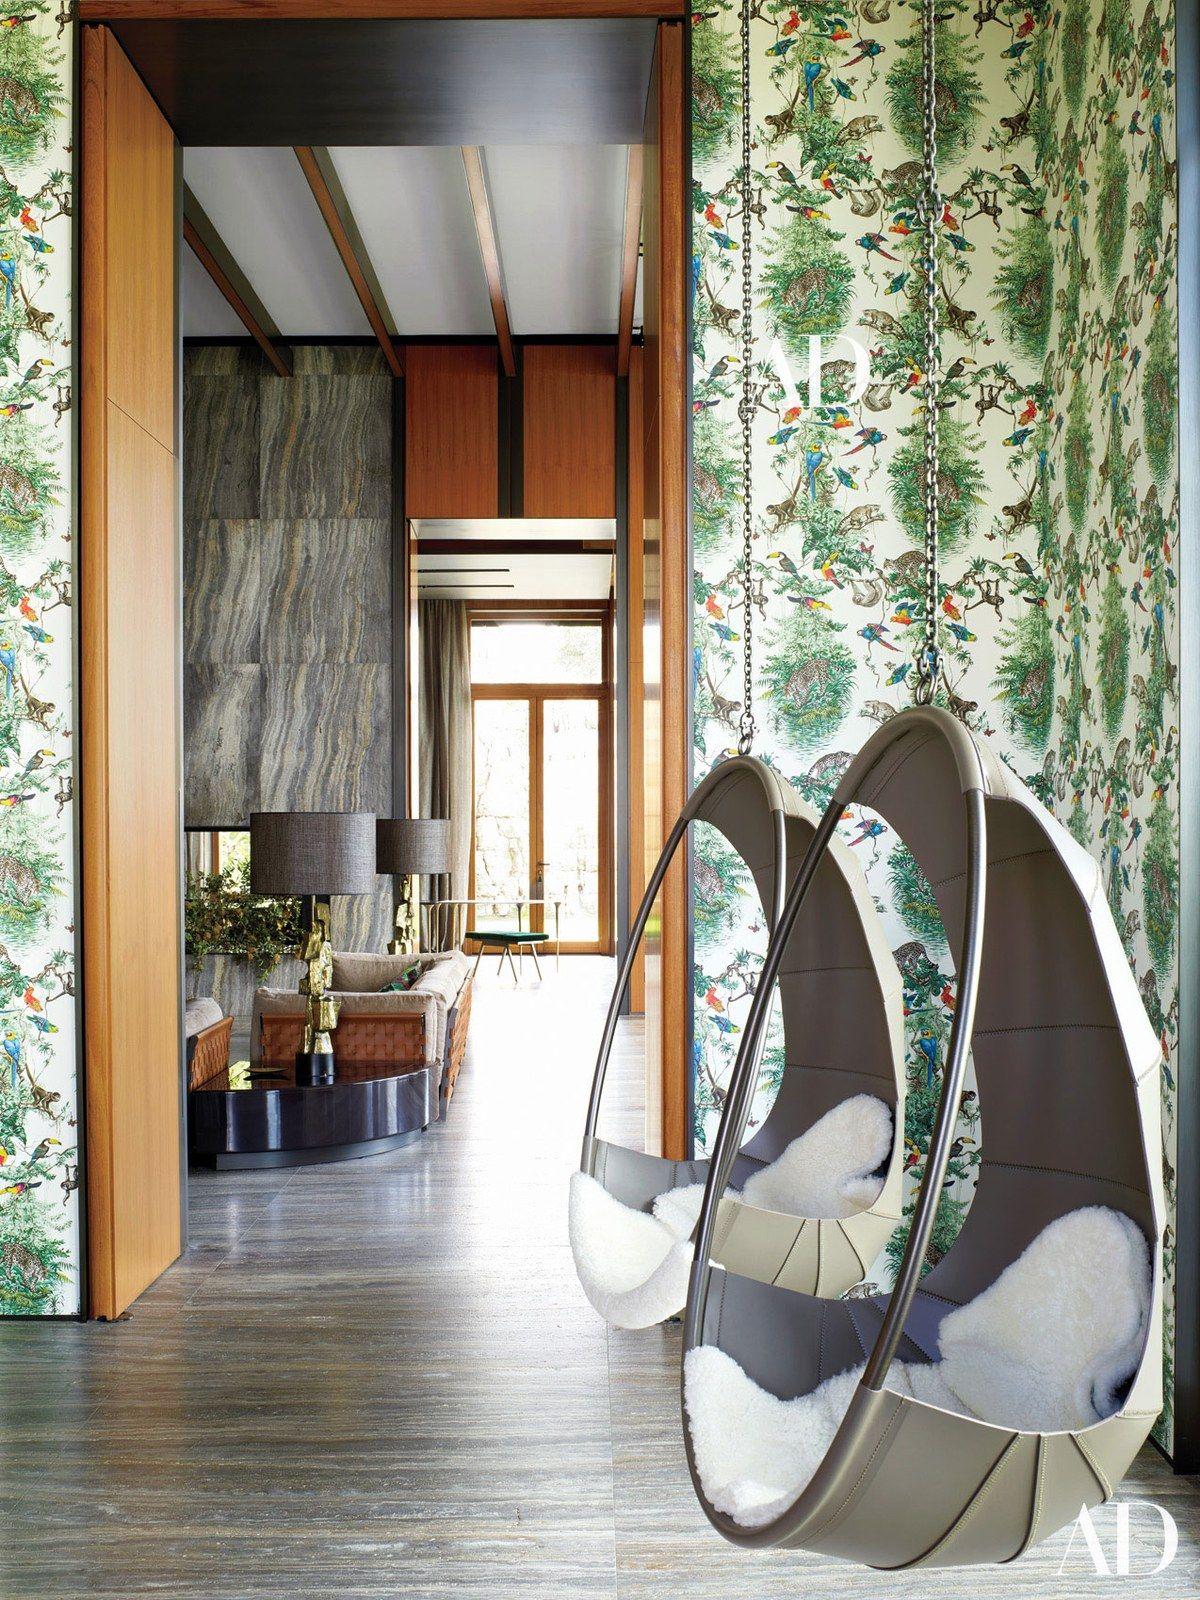 Ivano Redaelli swing chairs hang in the